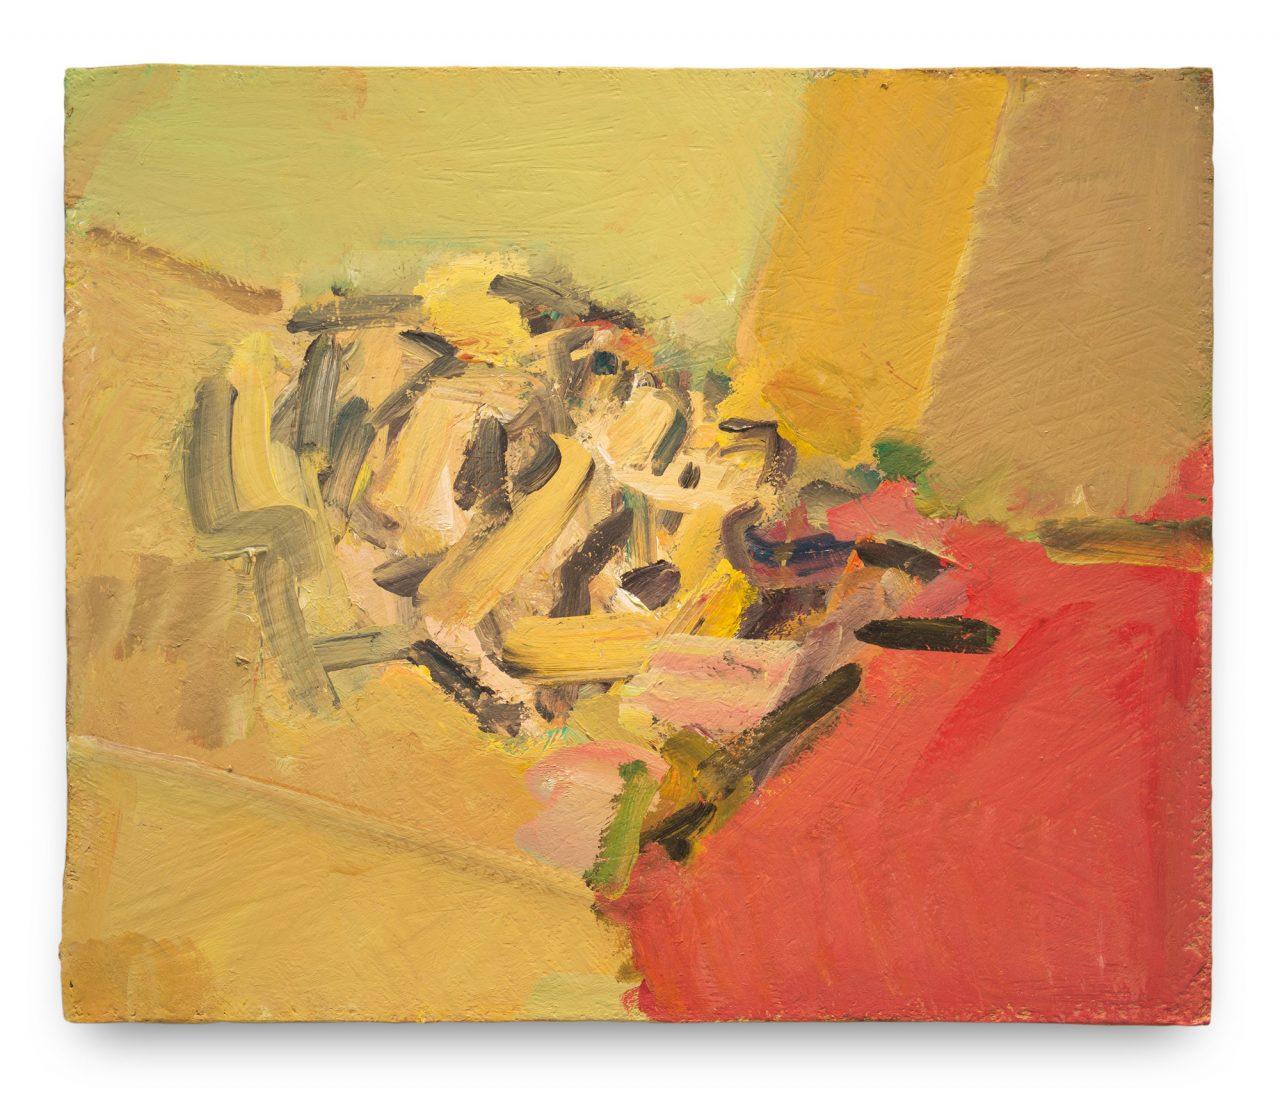 https://www.artsandcollections.com/wp-content/uploads/2020/11/AUE00022-Auerbach-Reclining-Head-of-Julia-II-2011-1280x1093.jpg